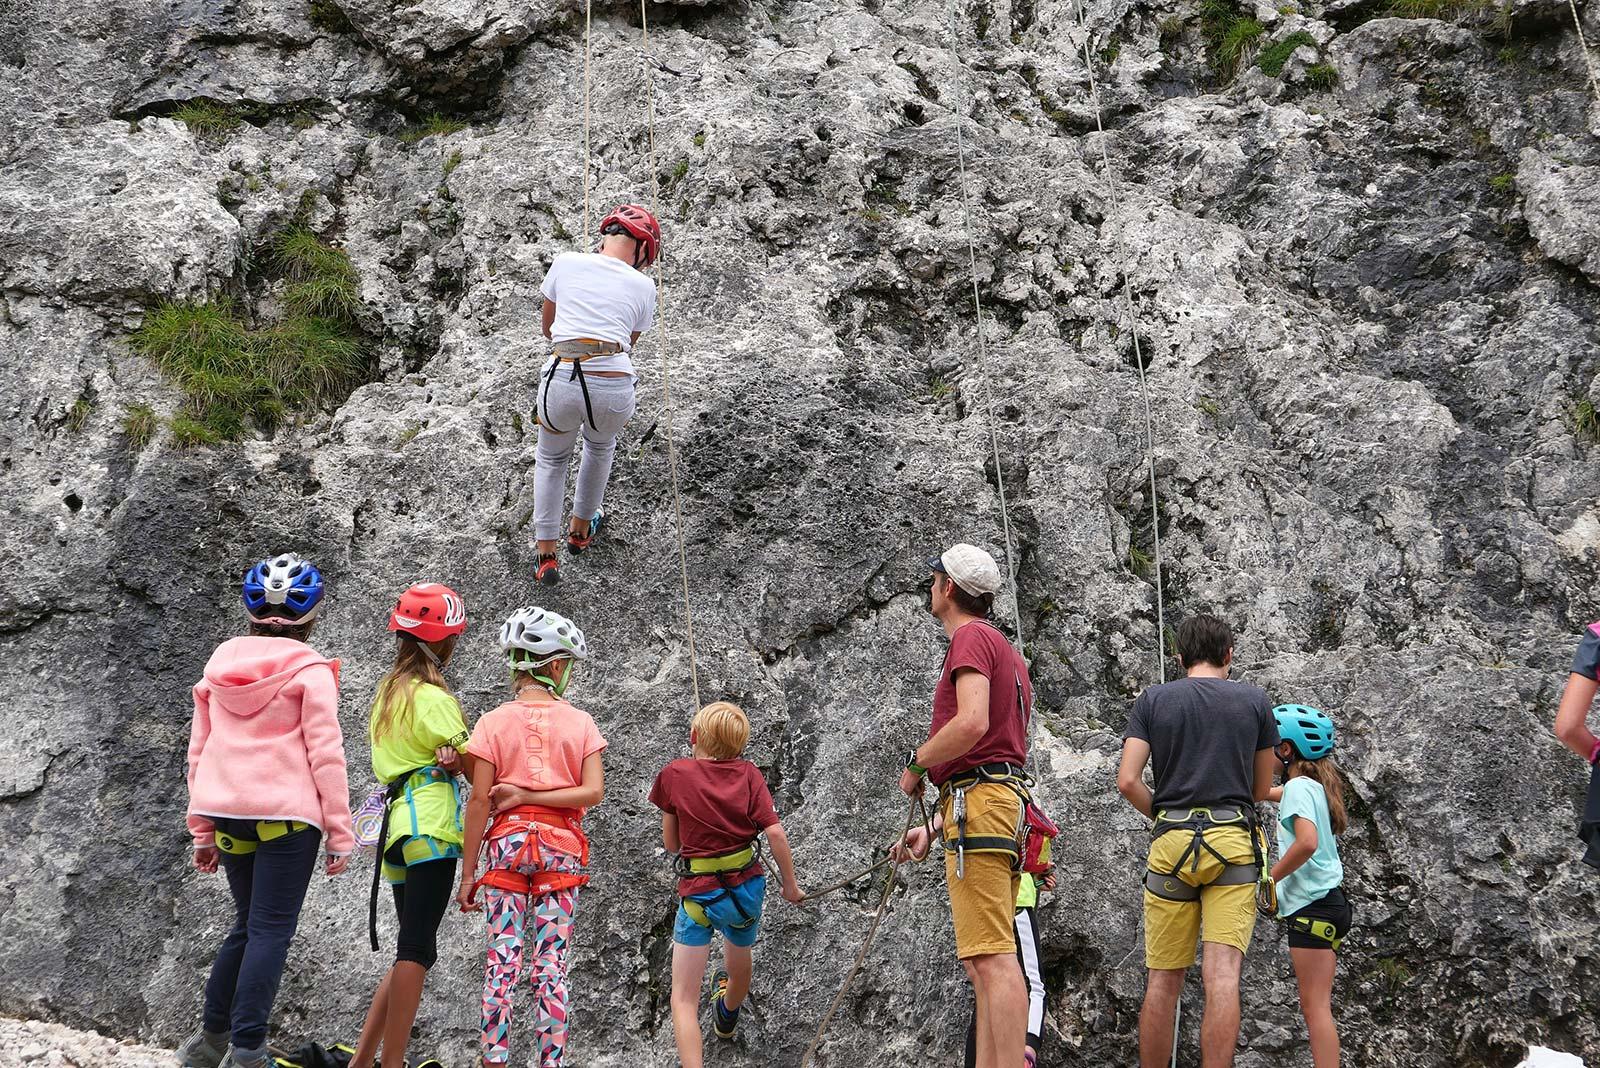 Bergsteigertipp: Toprope-Klettern